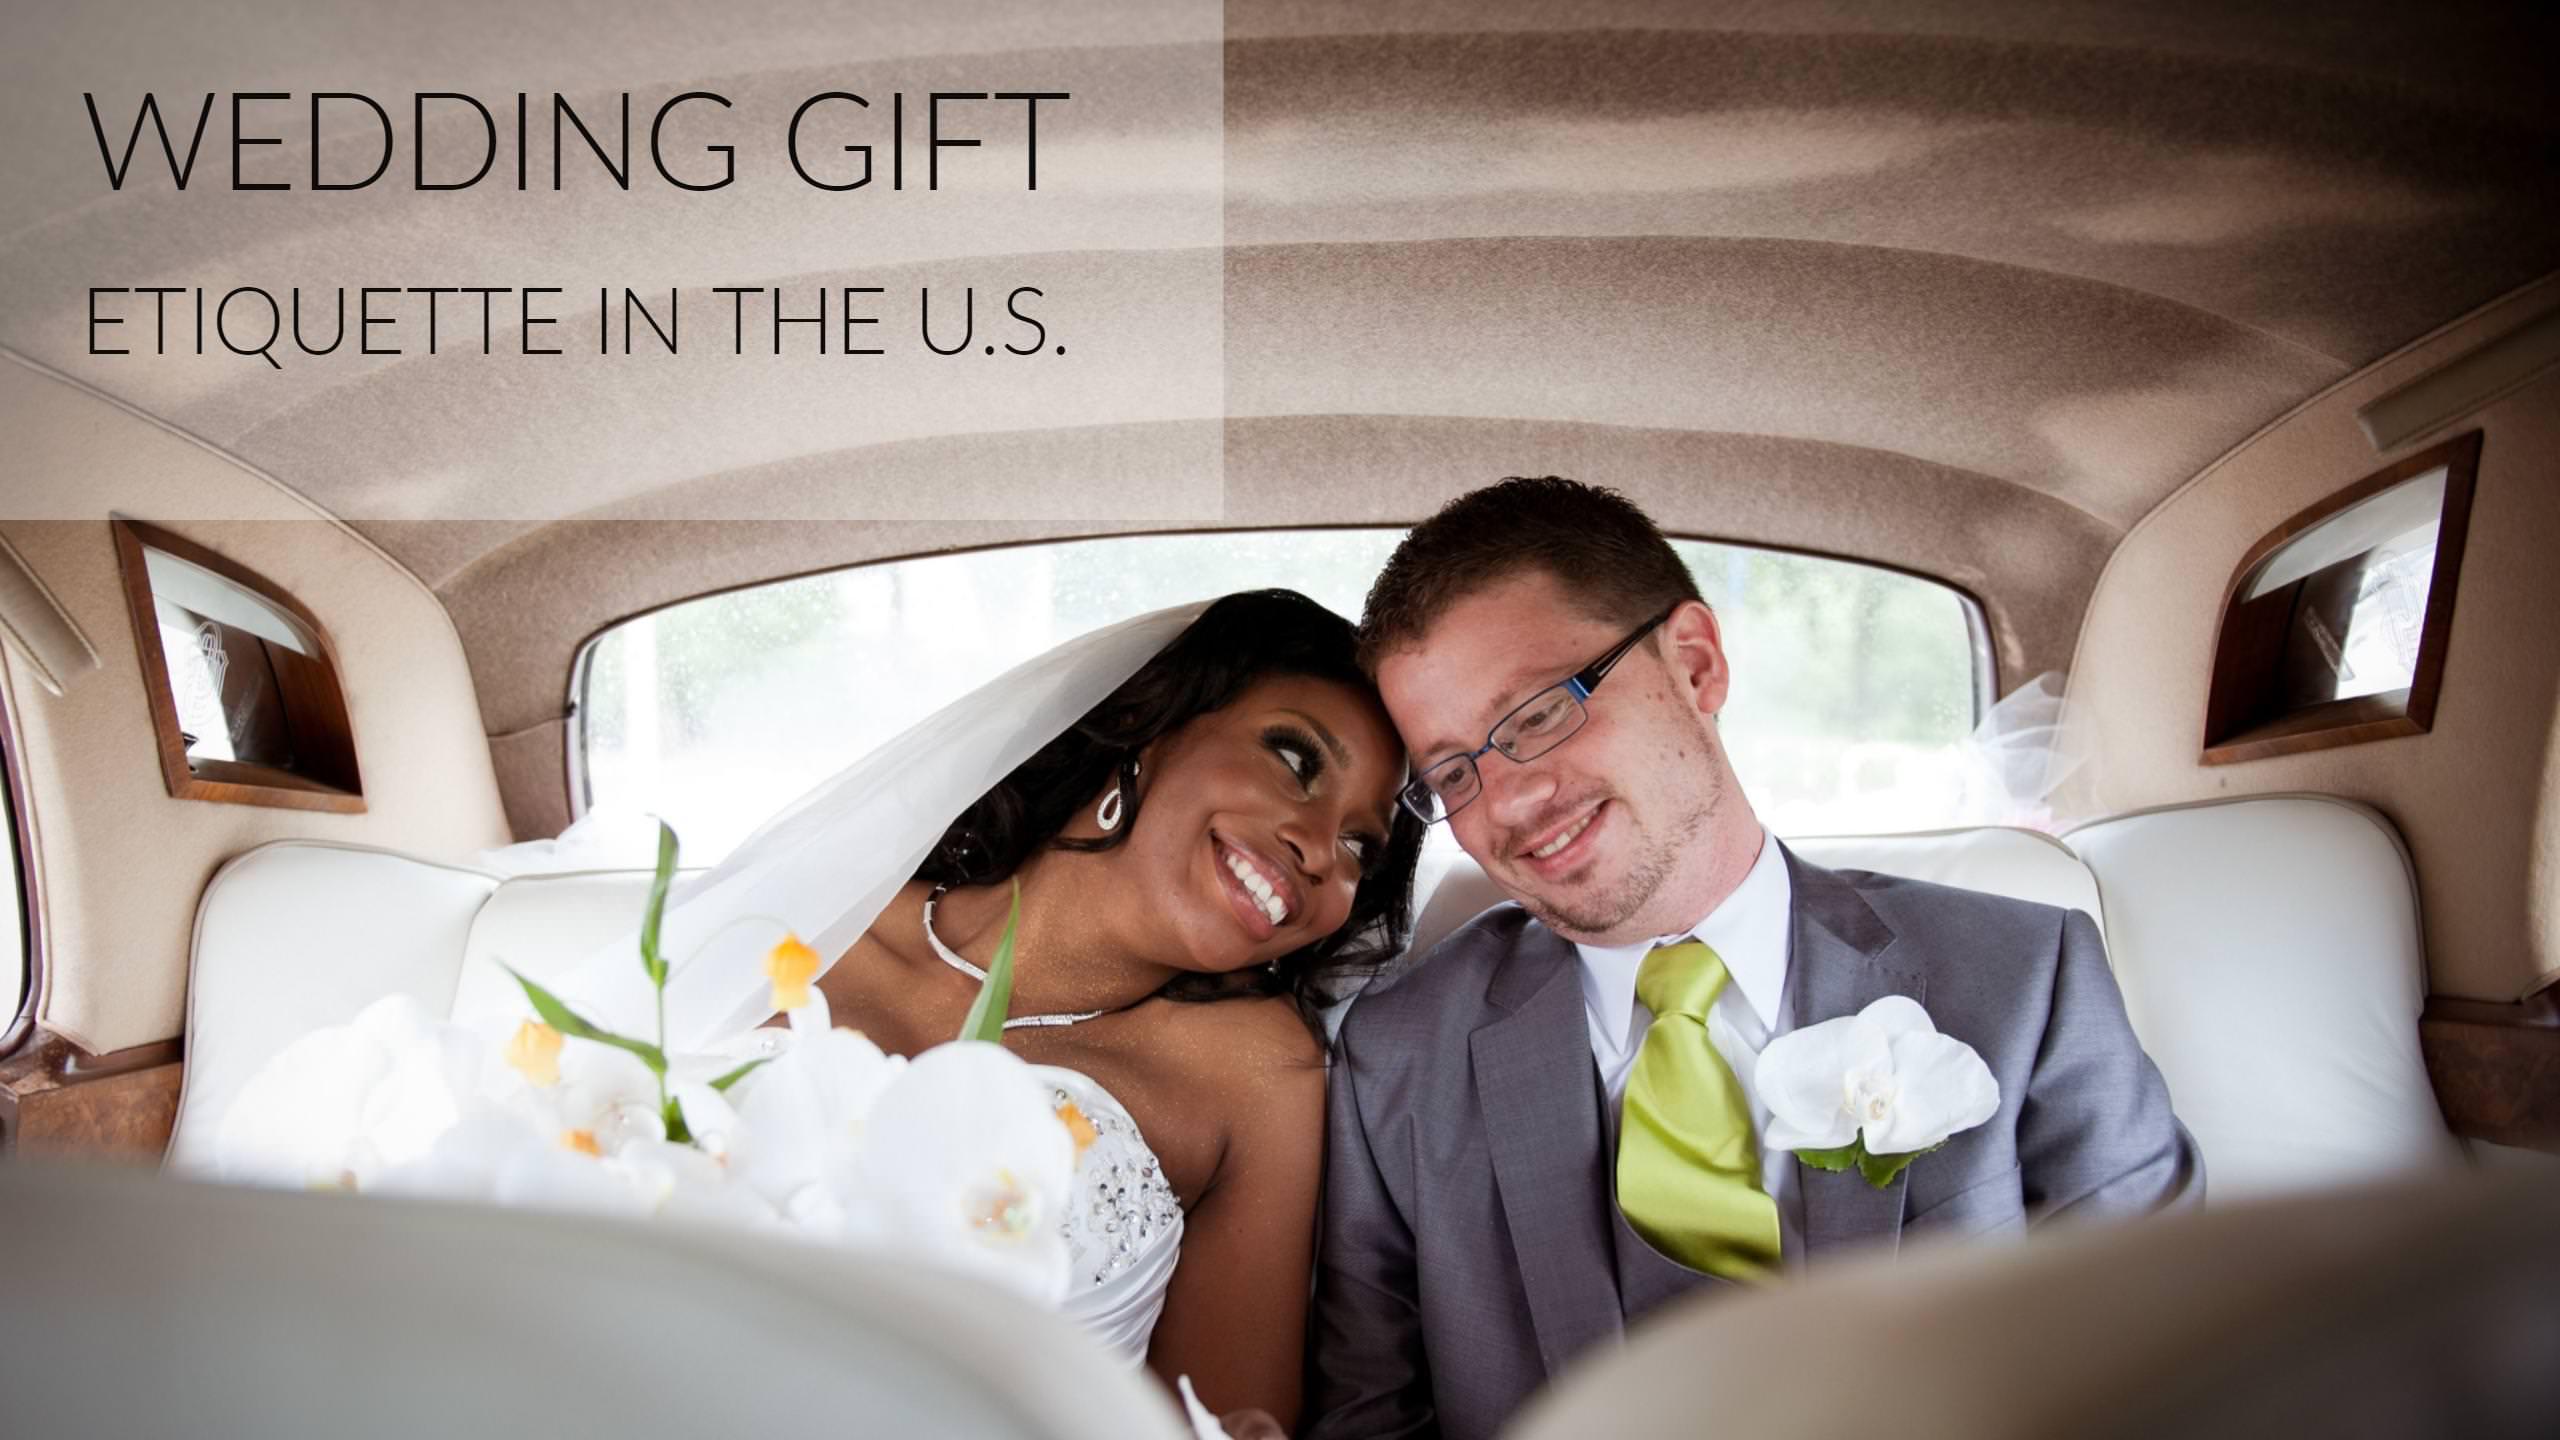 Wedding Gift Etiquette In The U.S.